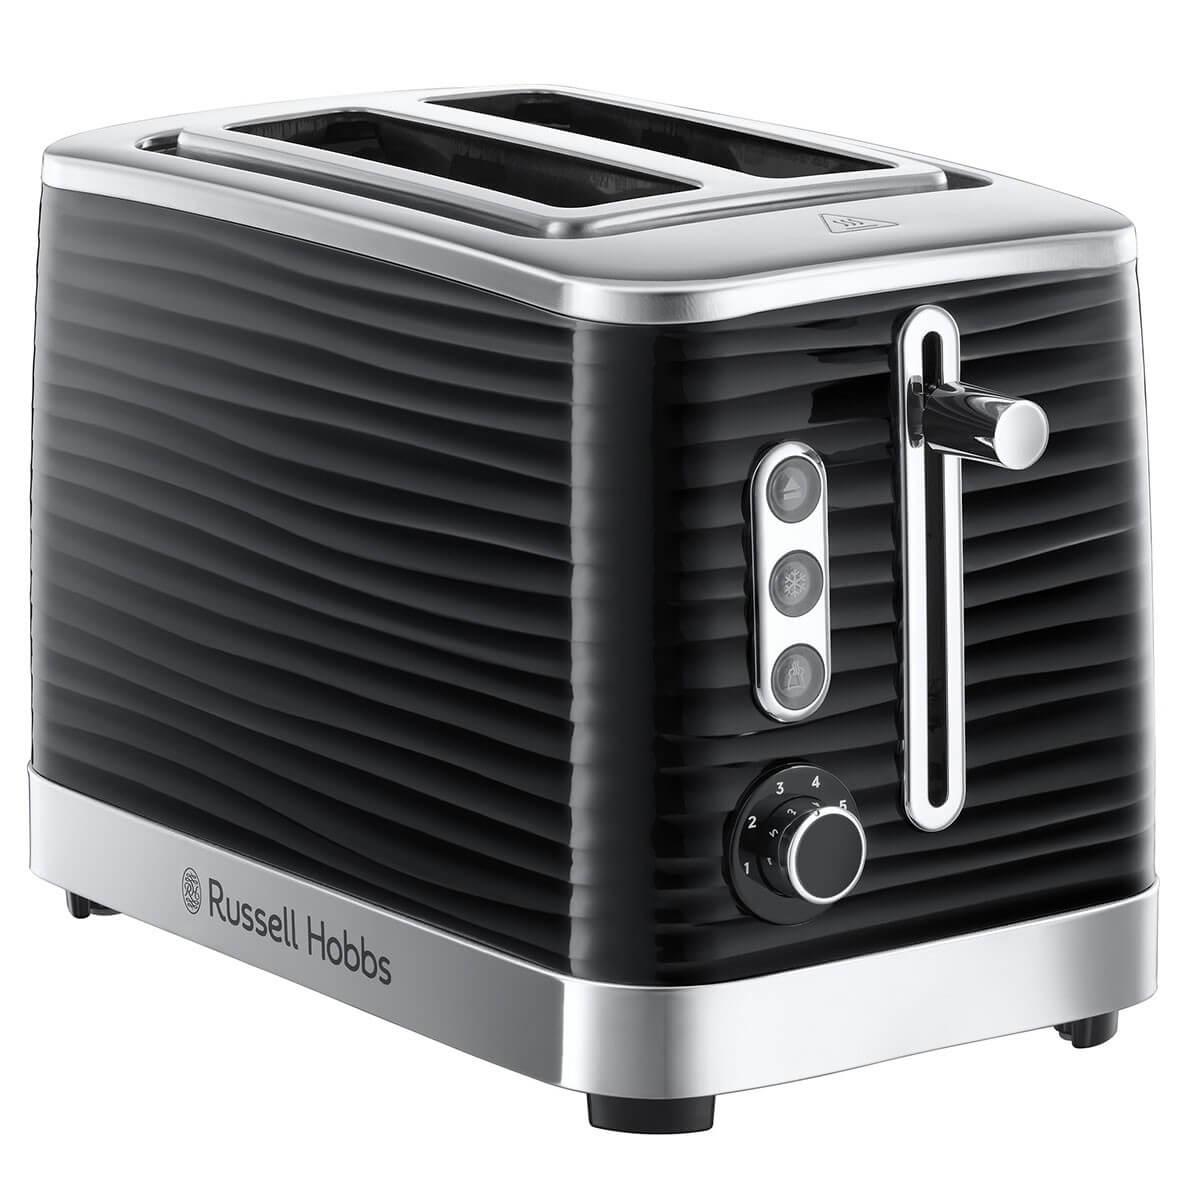 Russell Hobbs inspire black 2 slice toaster